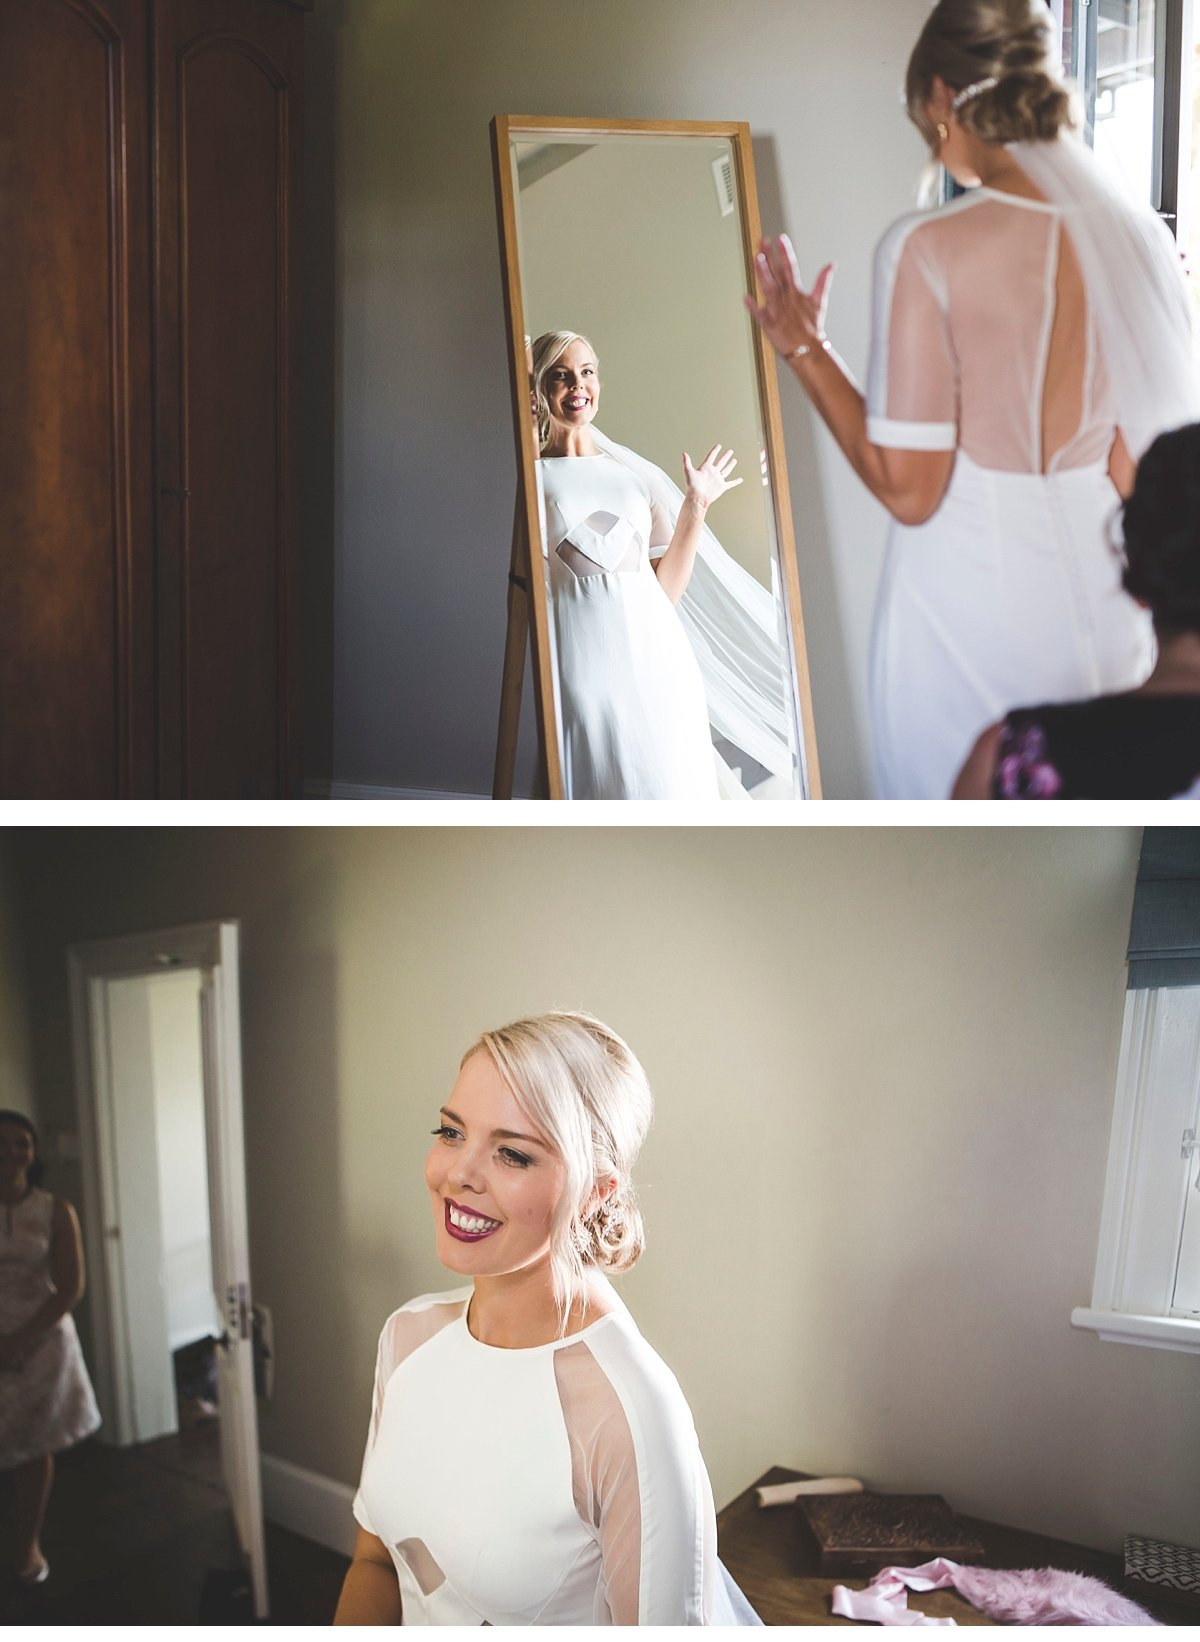 Burandana Hall wedding by Wagga Wagga Wedding Photographer Peppermint Studios_St Michaels Cathedral Wagga_Deniliquin weddings_0155